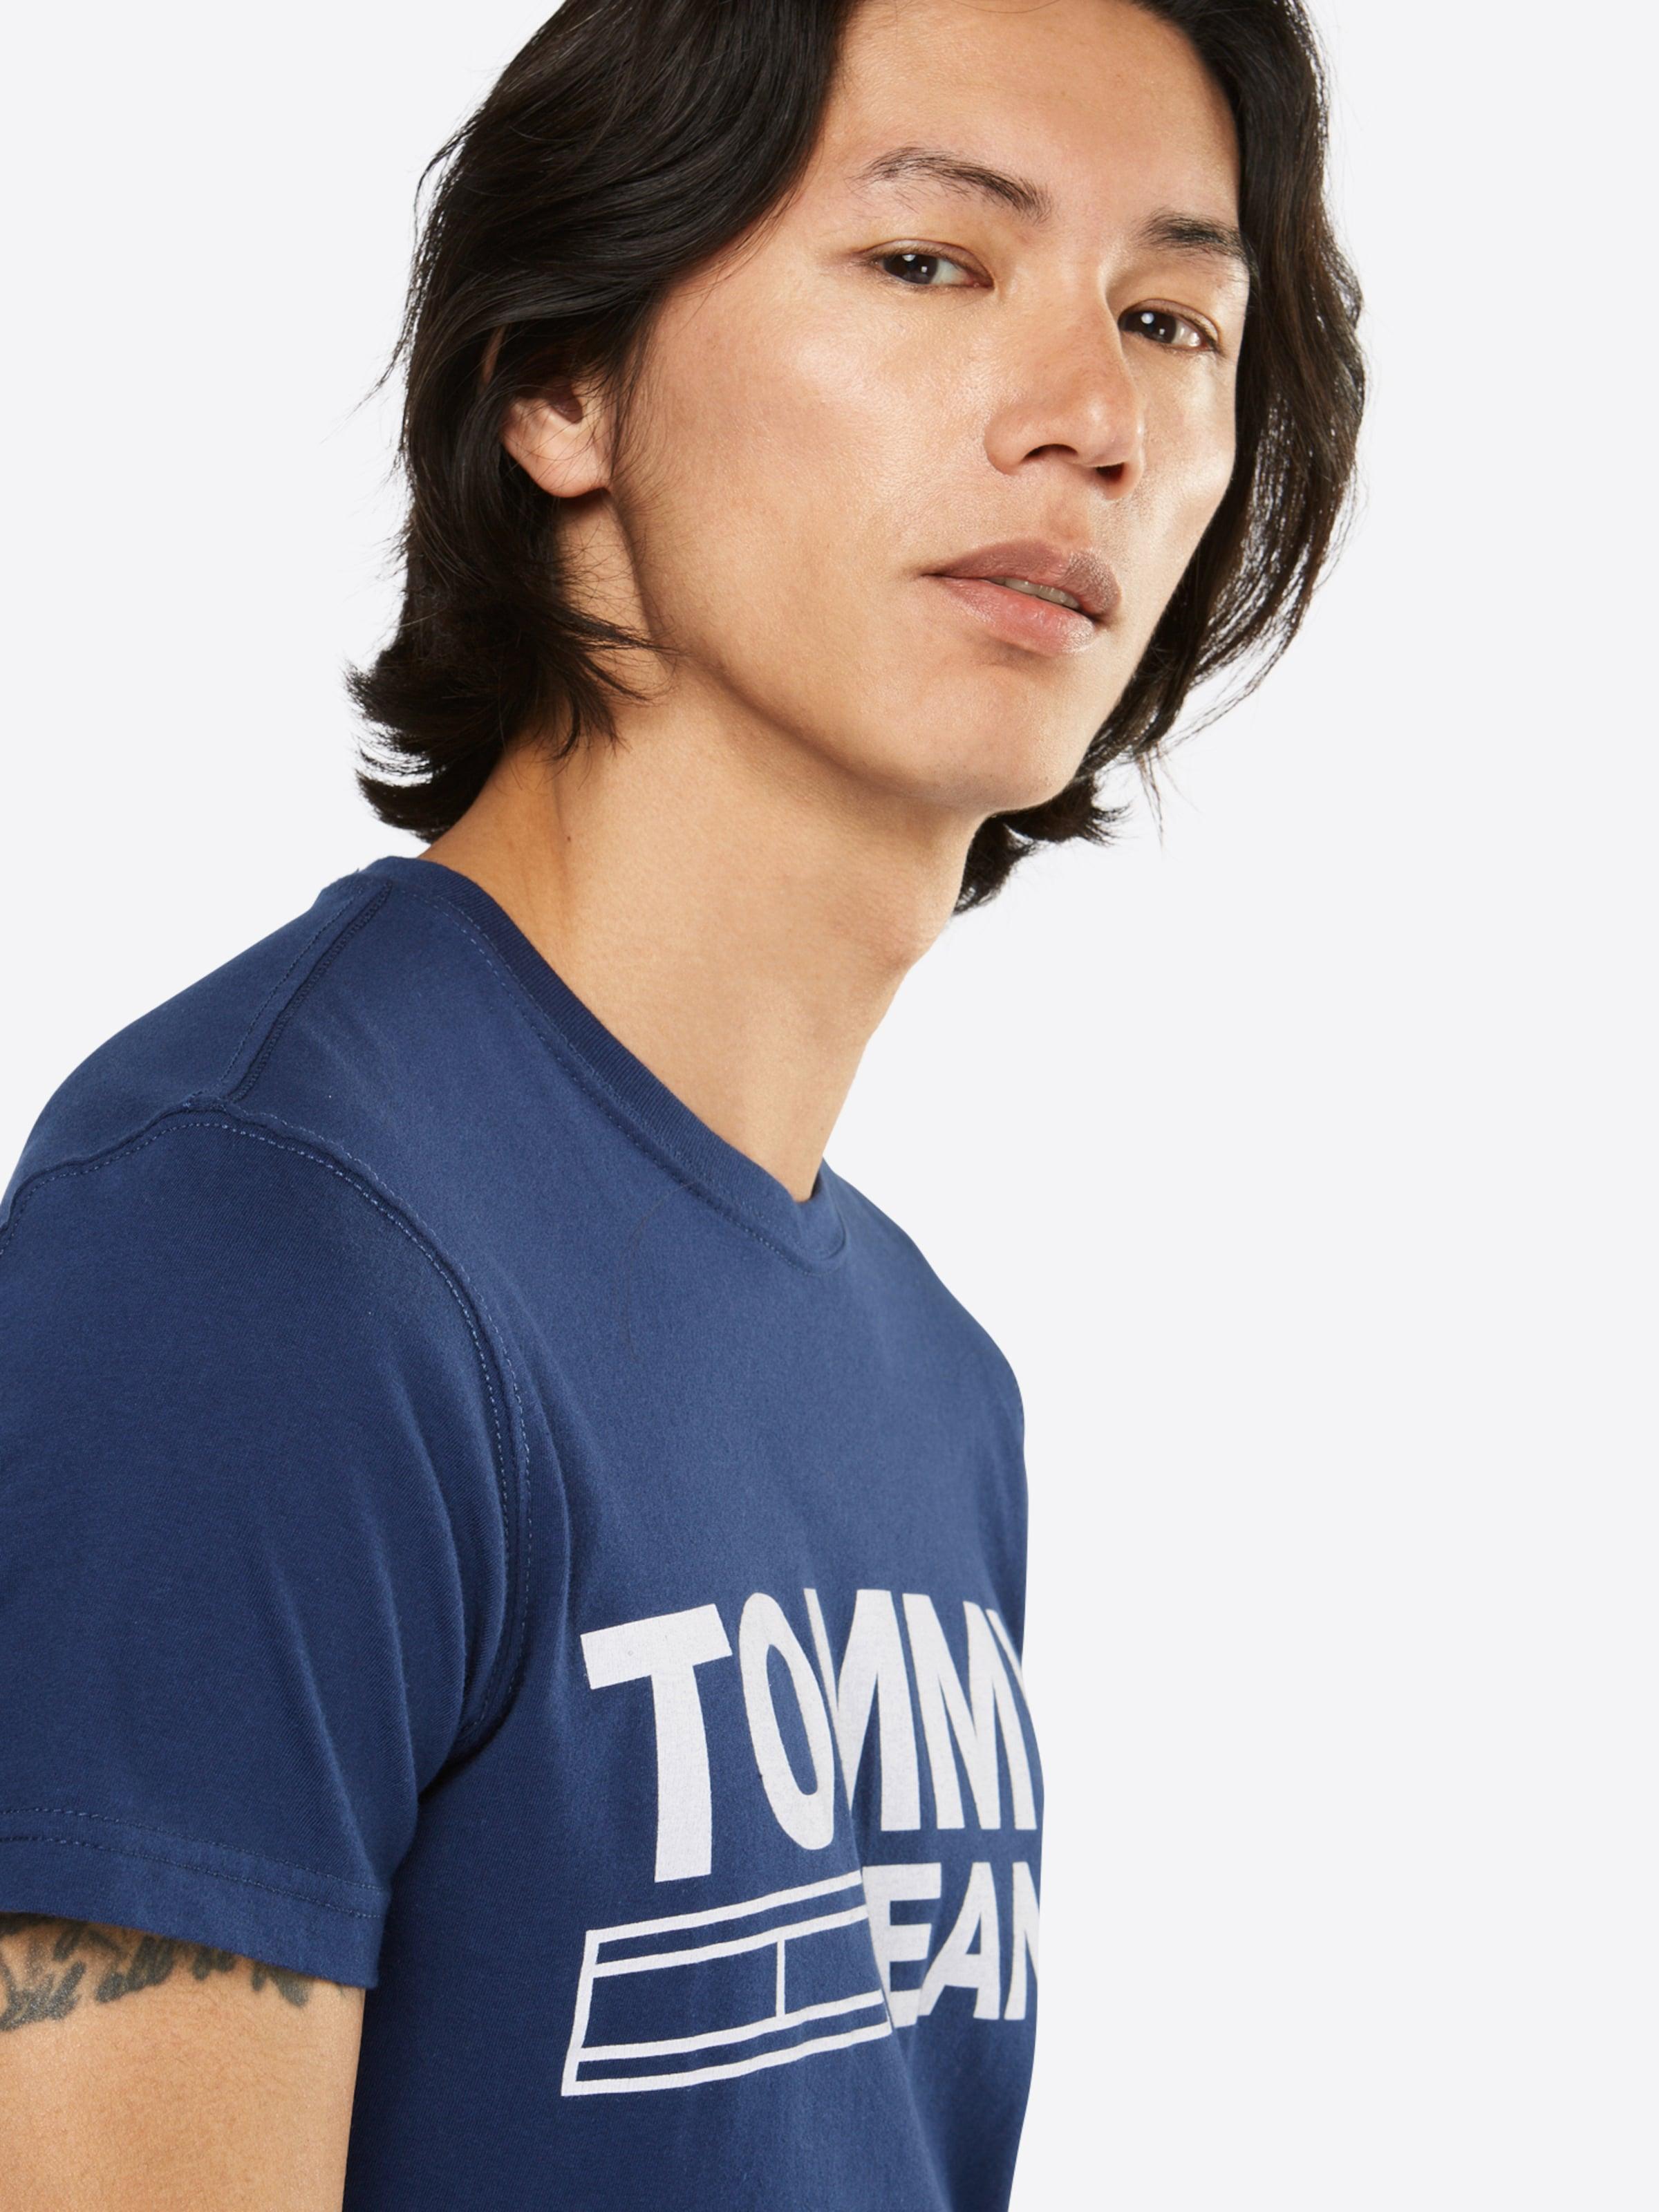 Tommy Jeans Logo-Shirt mit Print Rabatt Niedriger Preis ZKoKy4